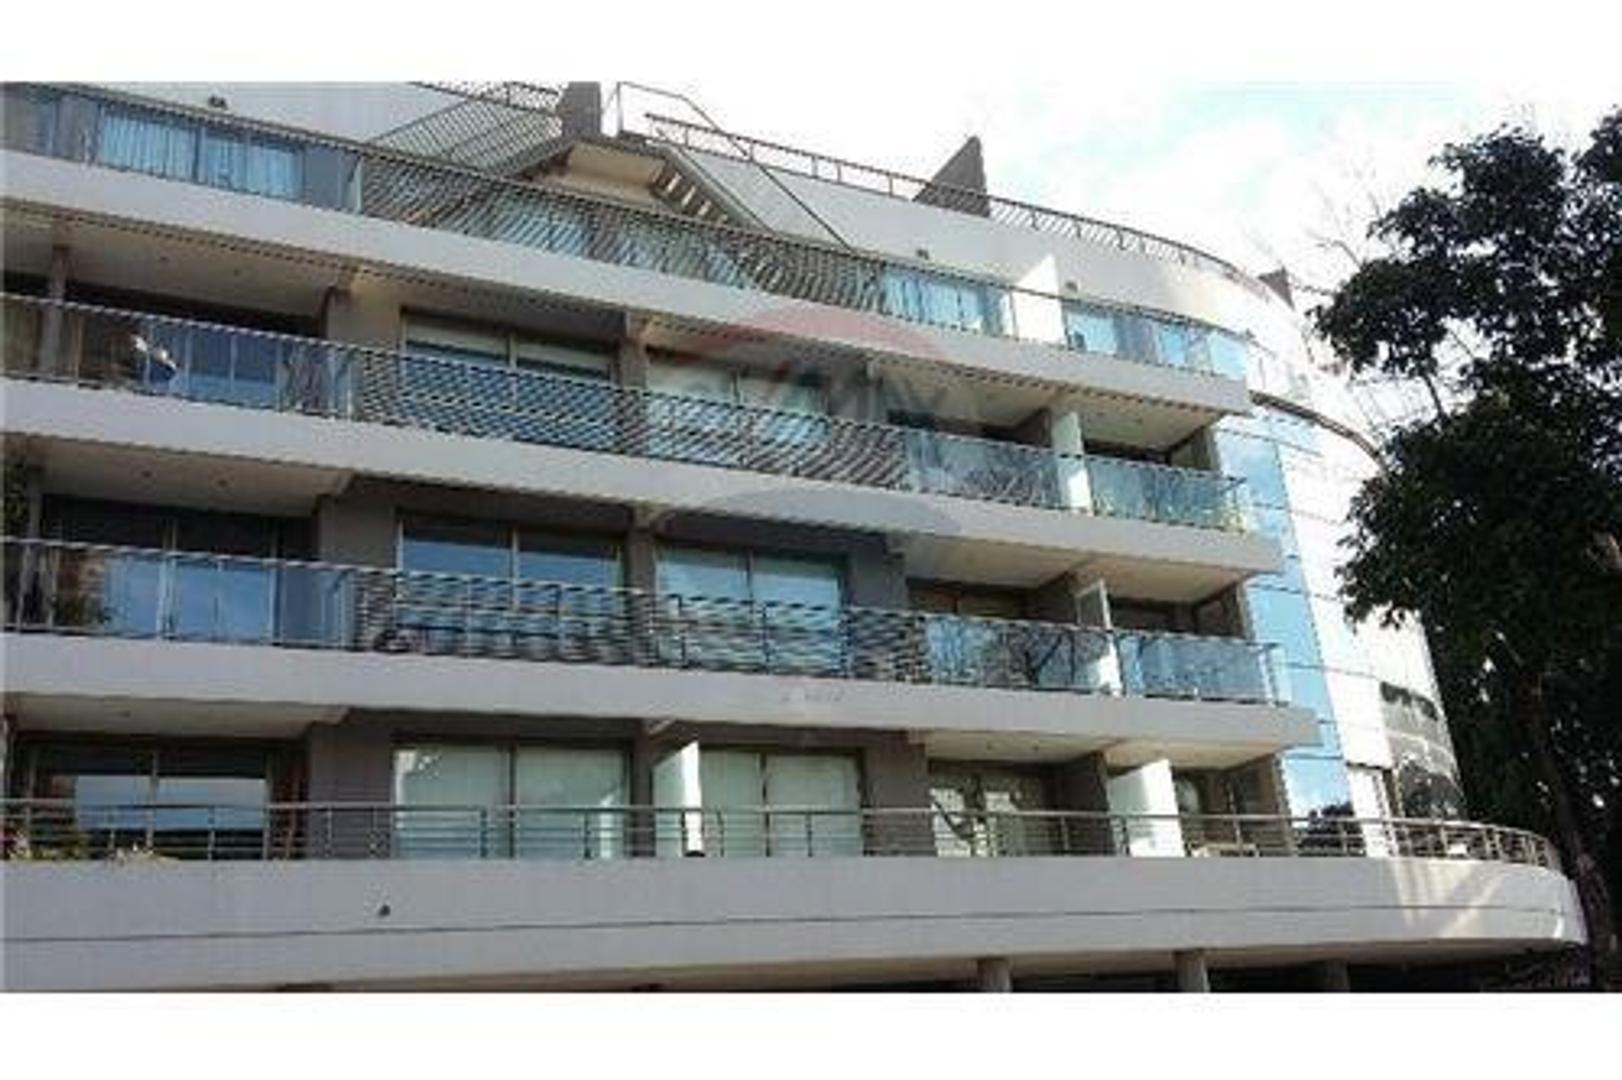 Duplex amueb 2amb 100m c/terraza, coch (paquete)